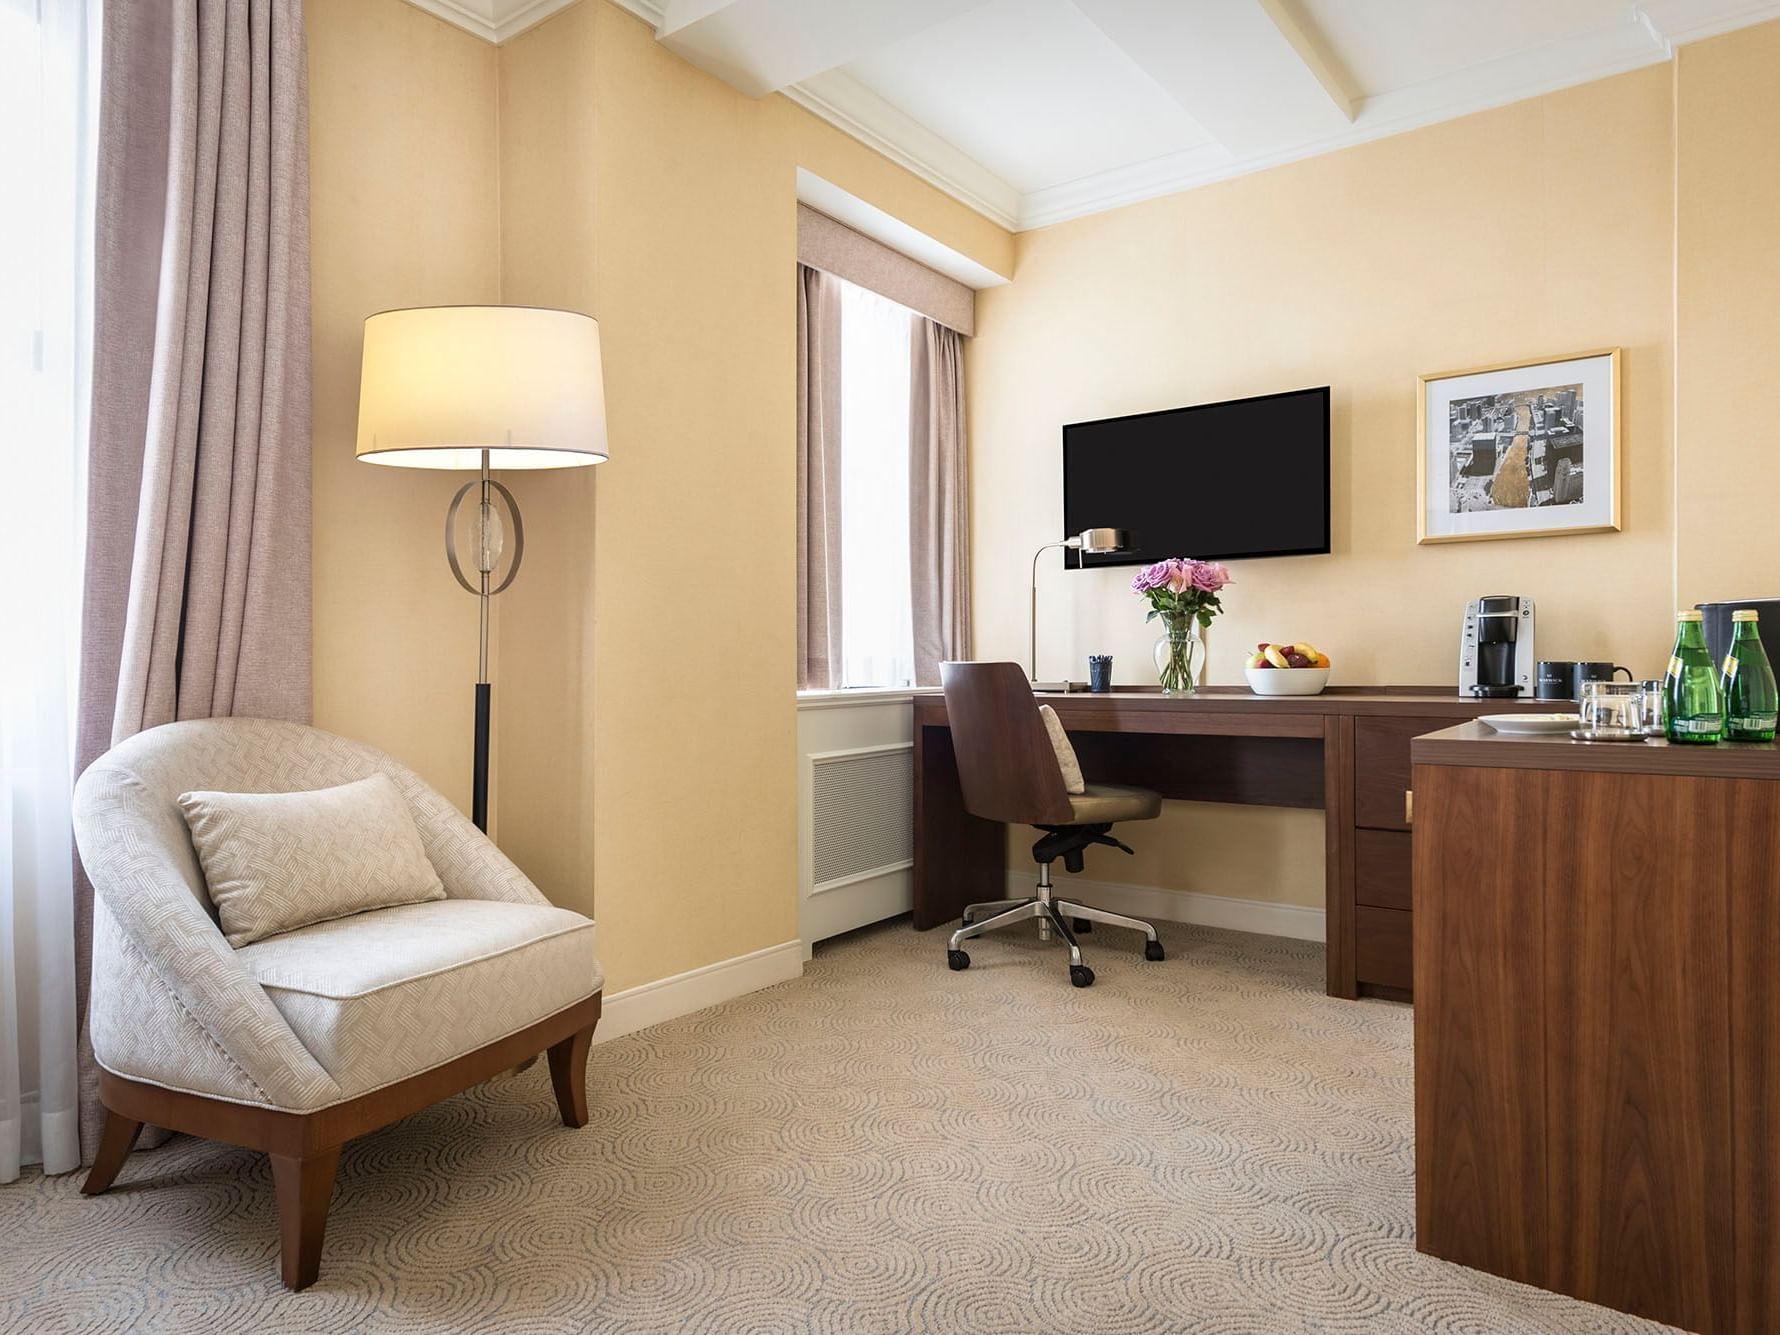 King Room - Desk Area